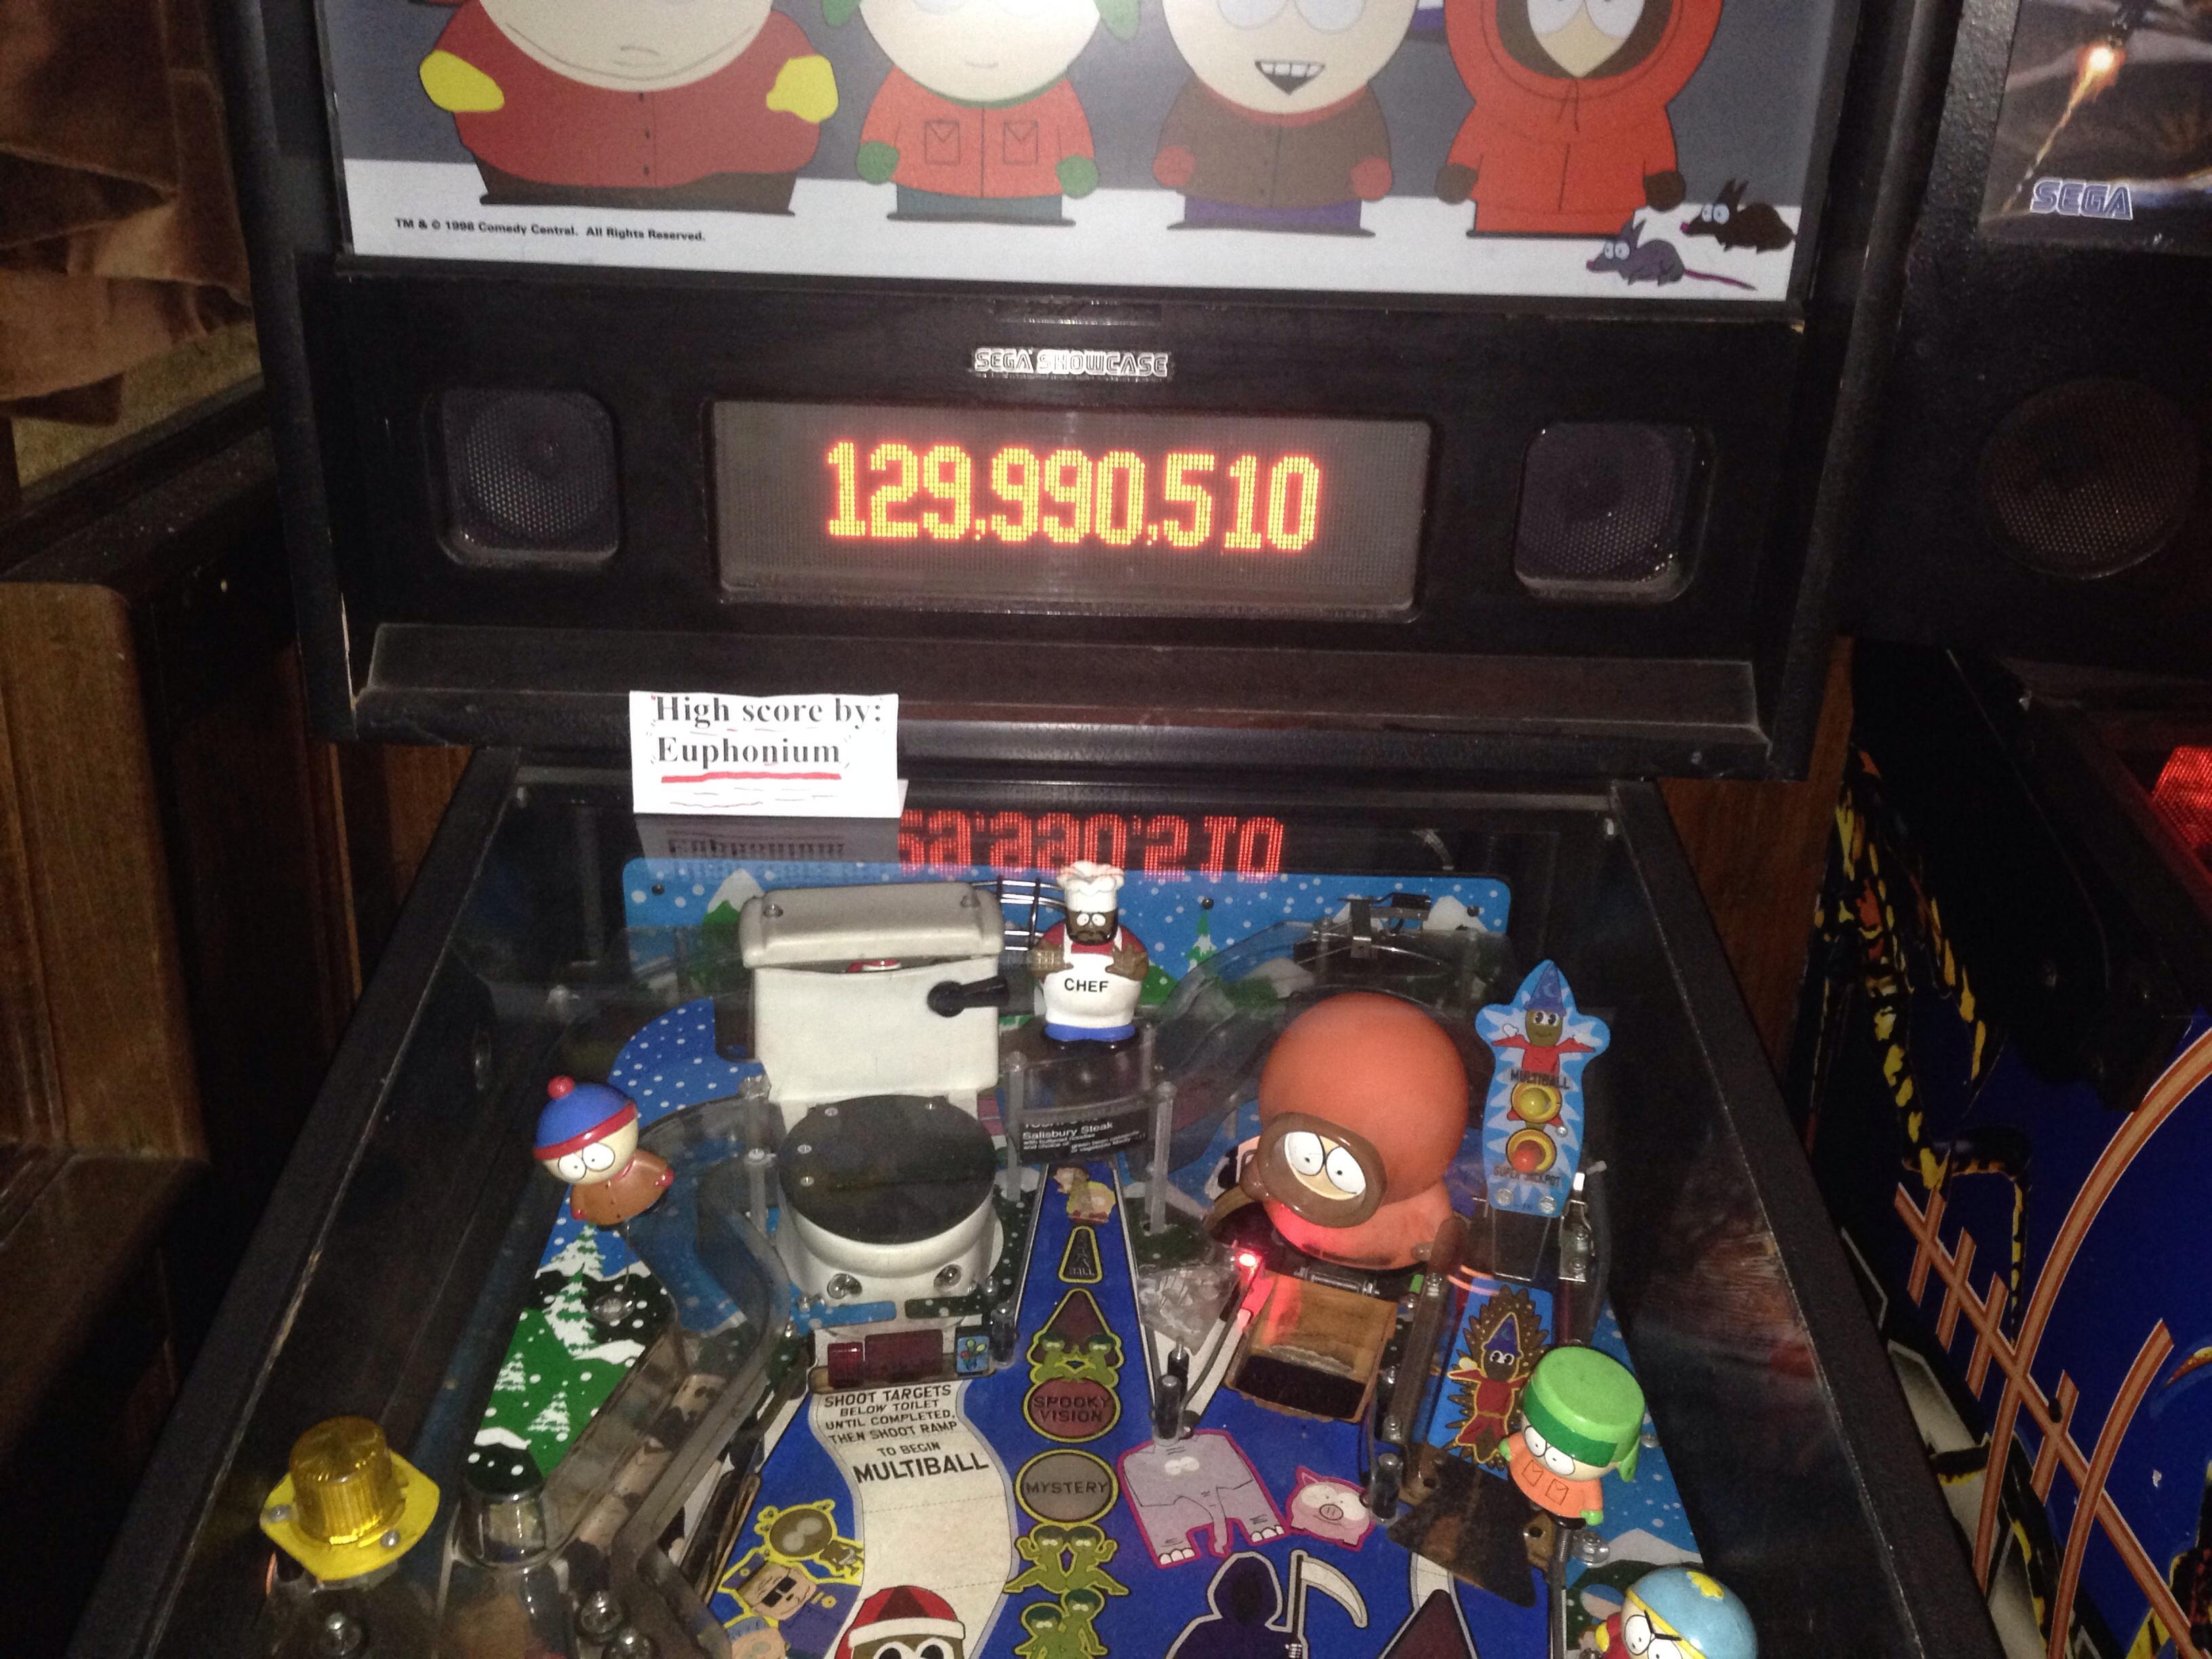 euphonium: South Park (Pinball: 3 Balls) 129,990,510 points on 2016-05-27 01:54:46